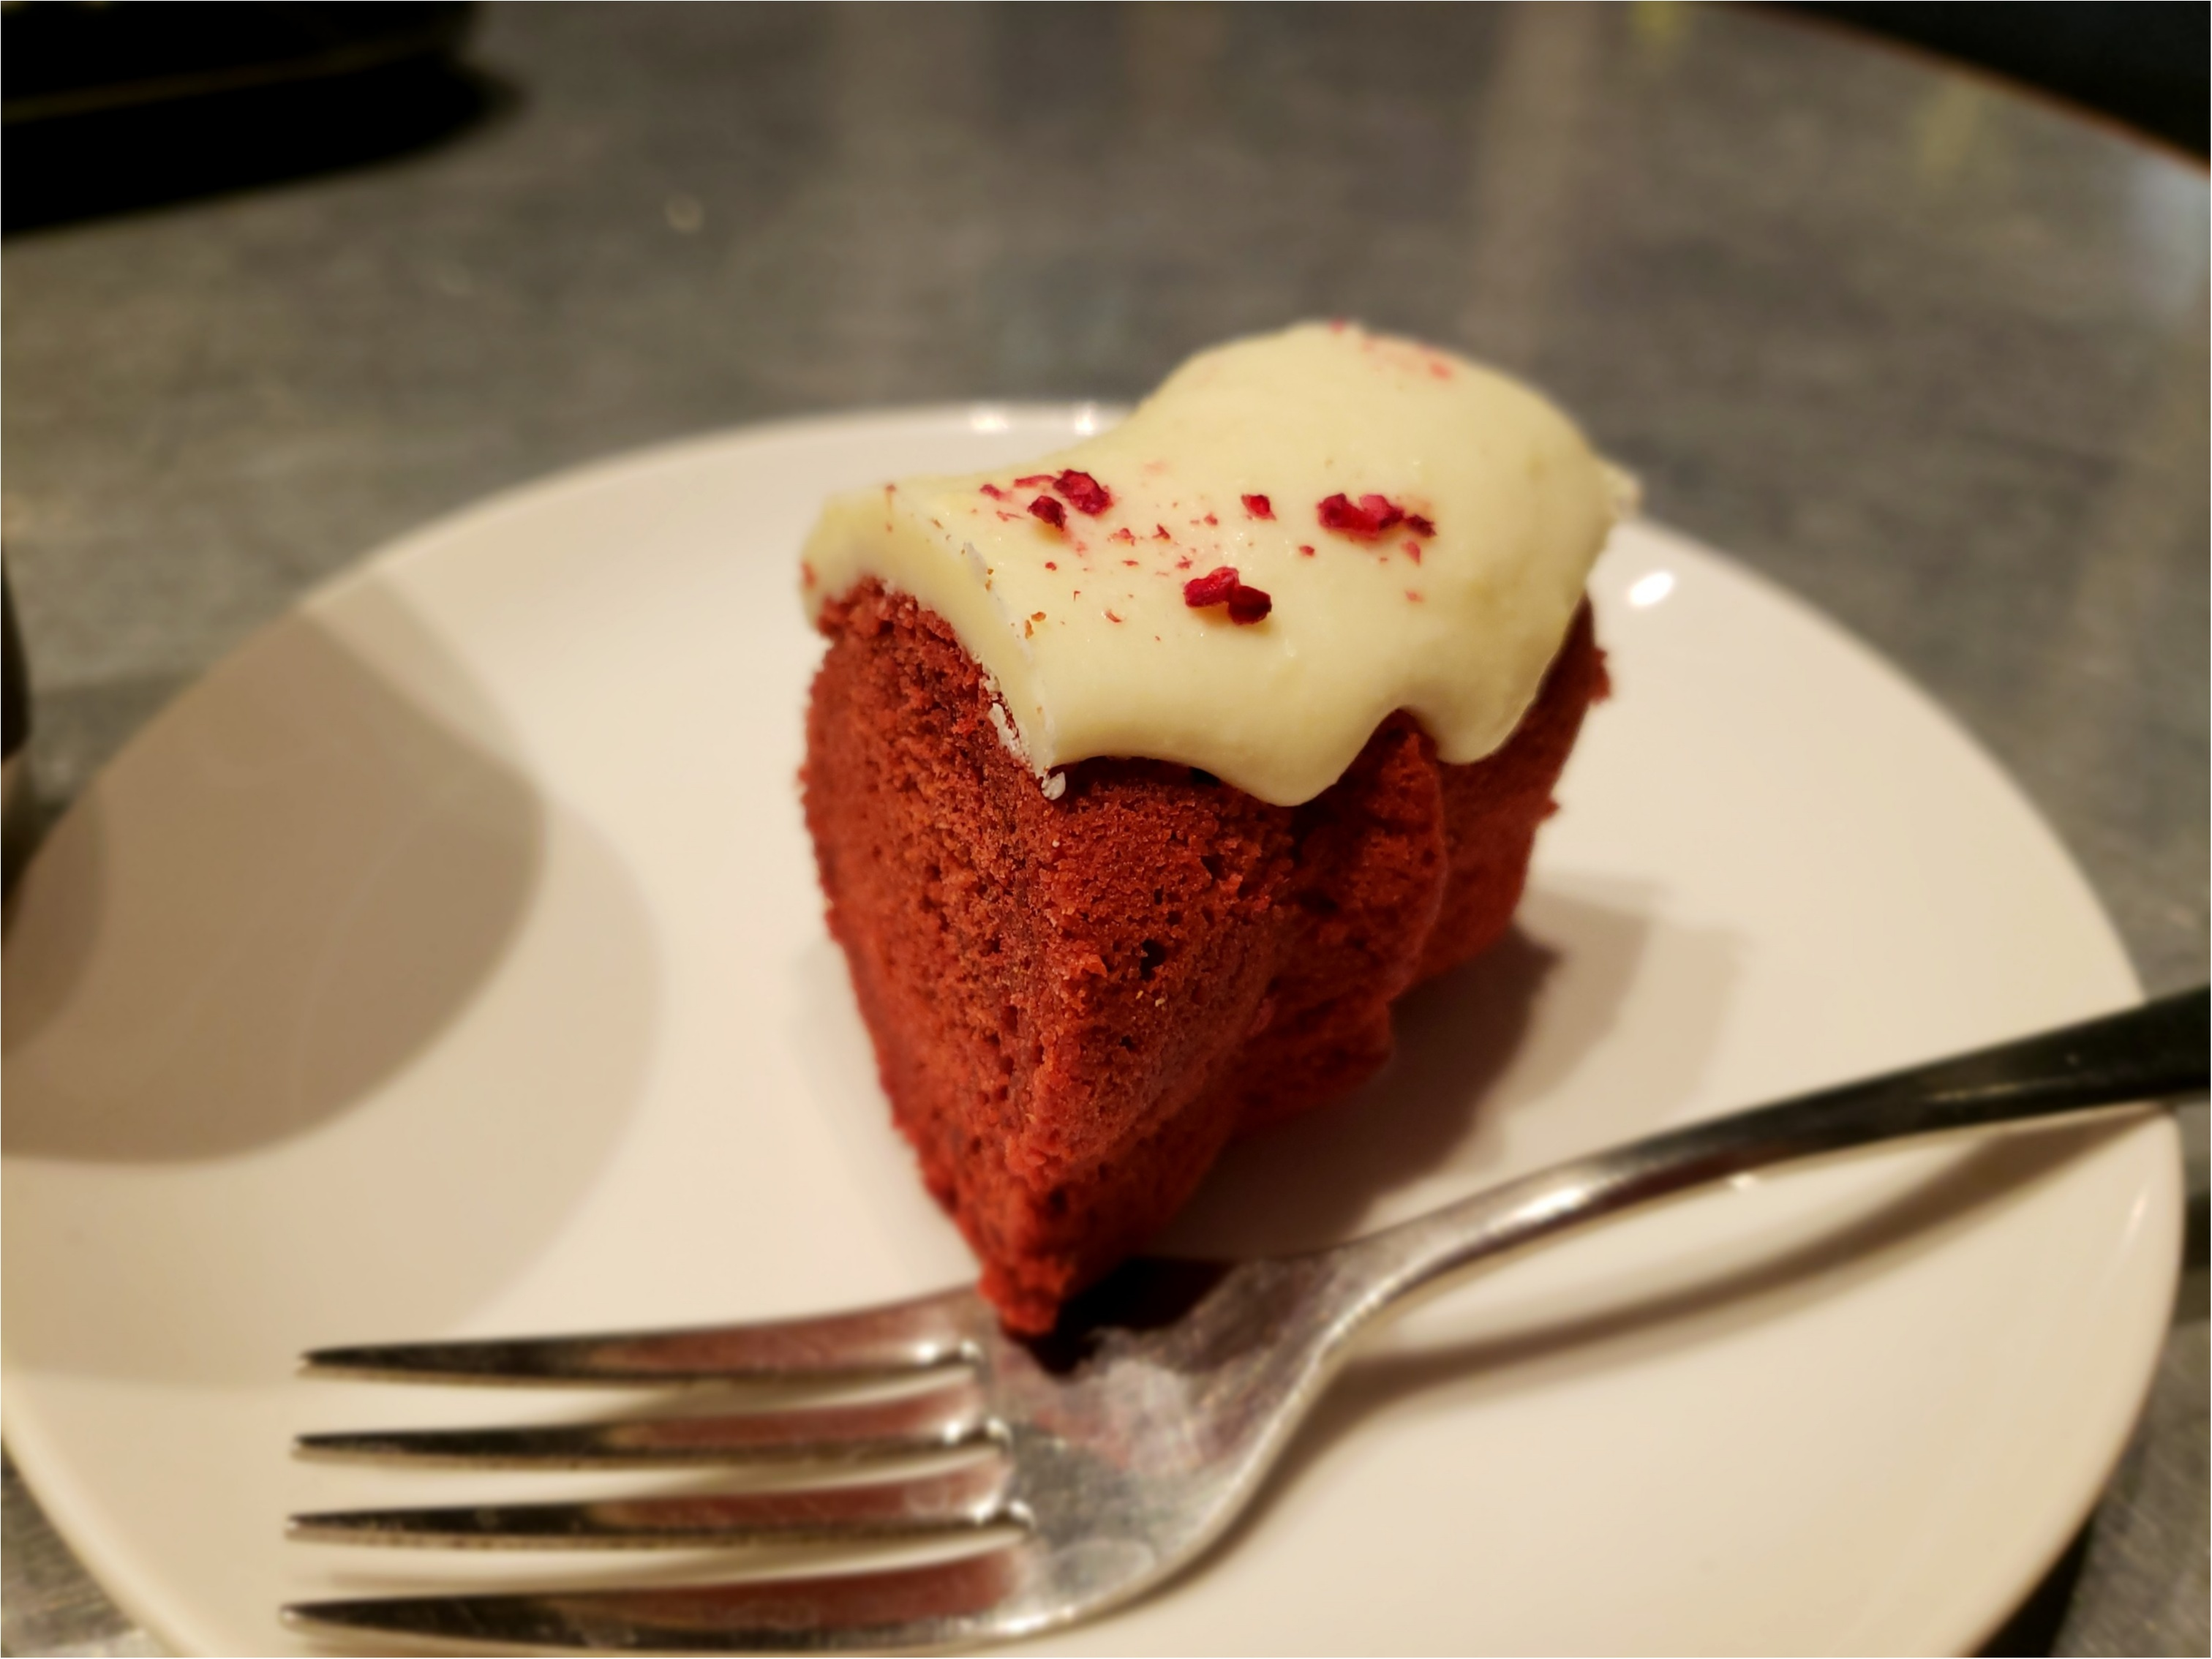 【DEAN&DELUCA】真っ赤なかわいいホリデーケーキ♡_3